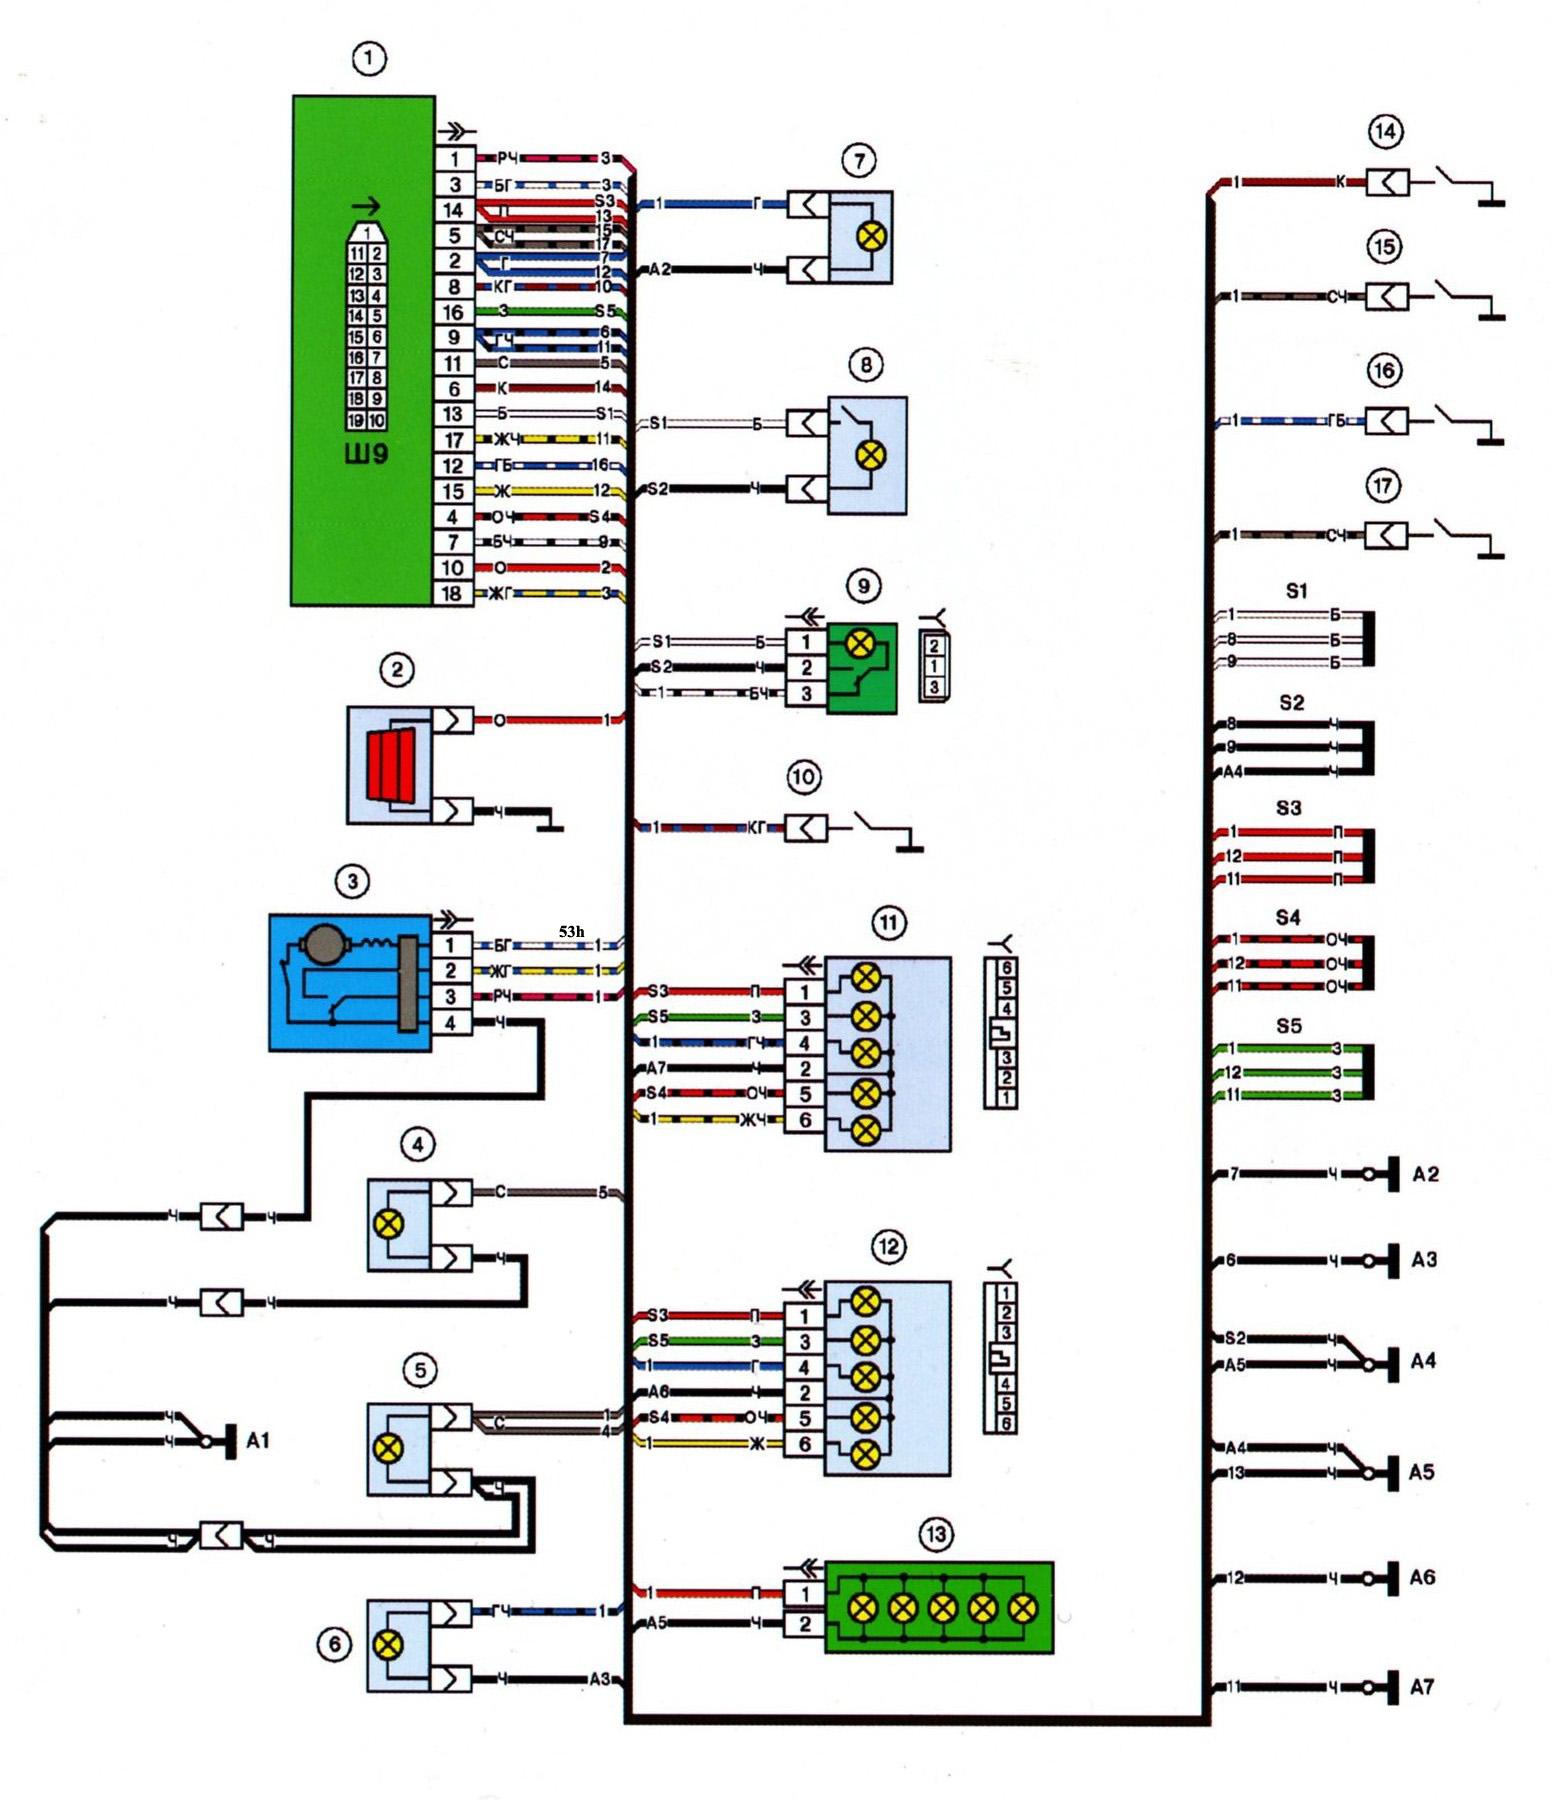 схема включения передних фар ваз 2110 инжектор